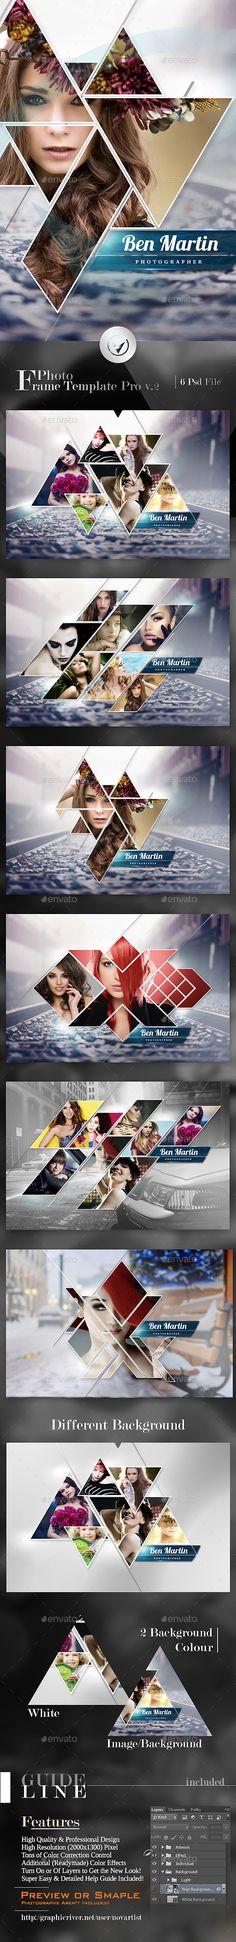 Photo Frame Template Pro #photography #psd Download: http://graphicriver.net/item/photo-frame-template-pro-v2/13207696?ref=ksioks